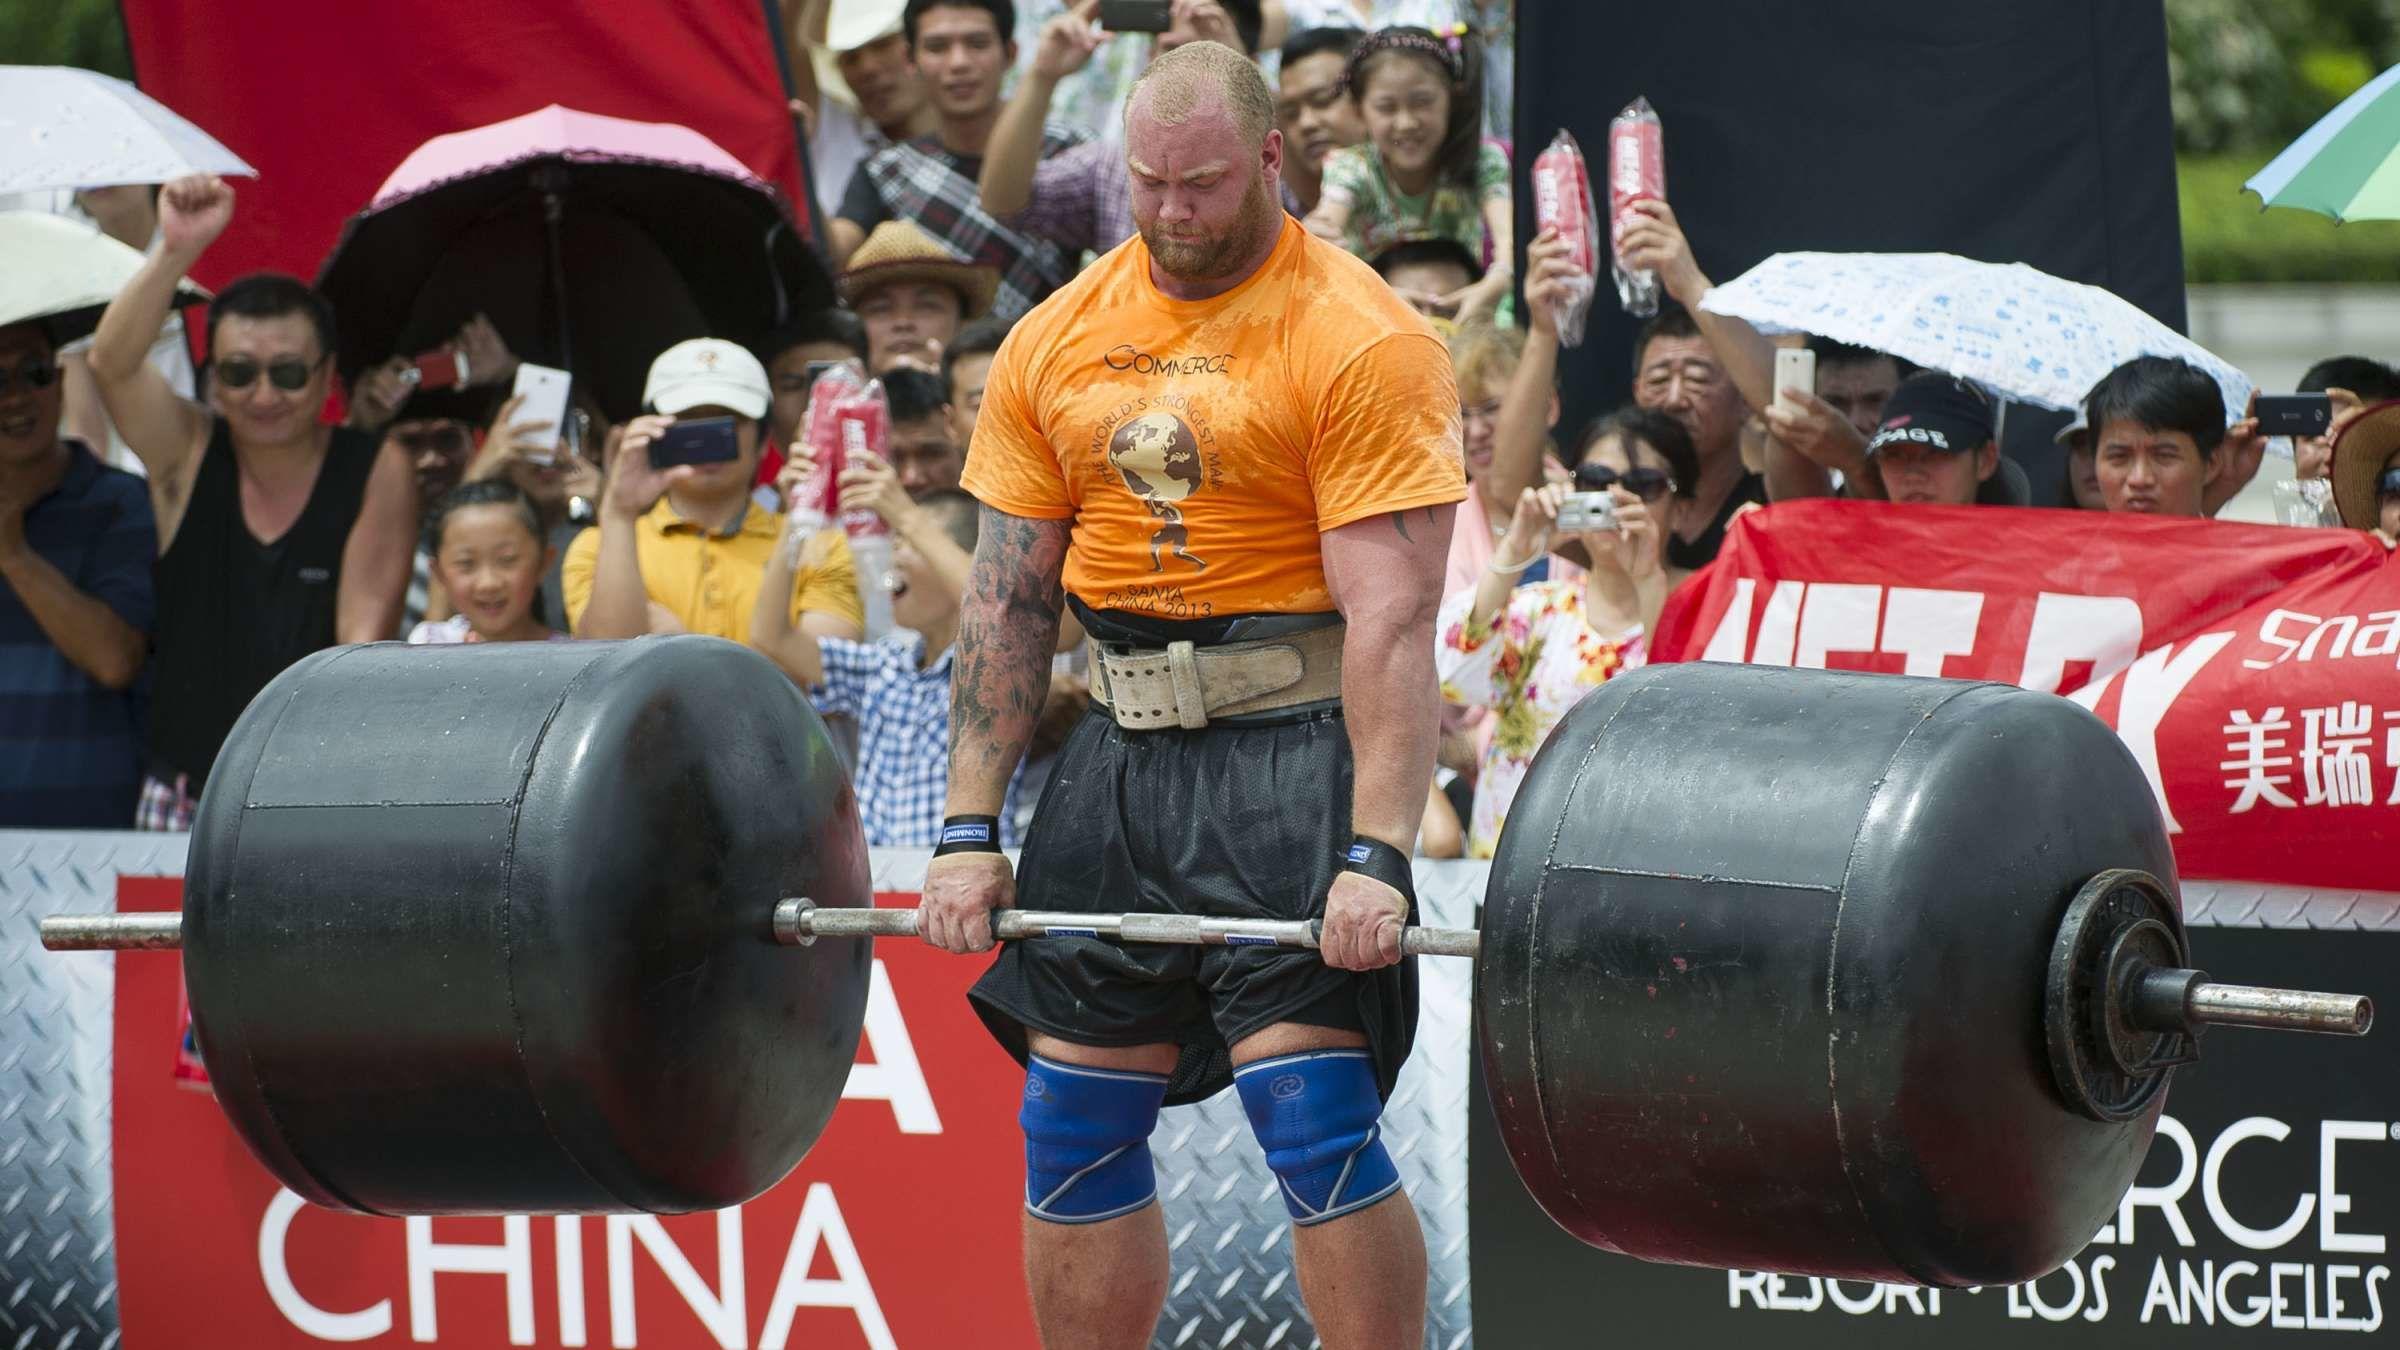 Game of Thrones's Hafþór Björnsson Broke a Major Deadlifting World Record